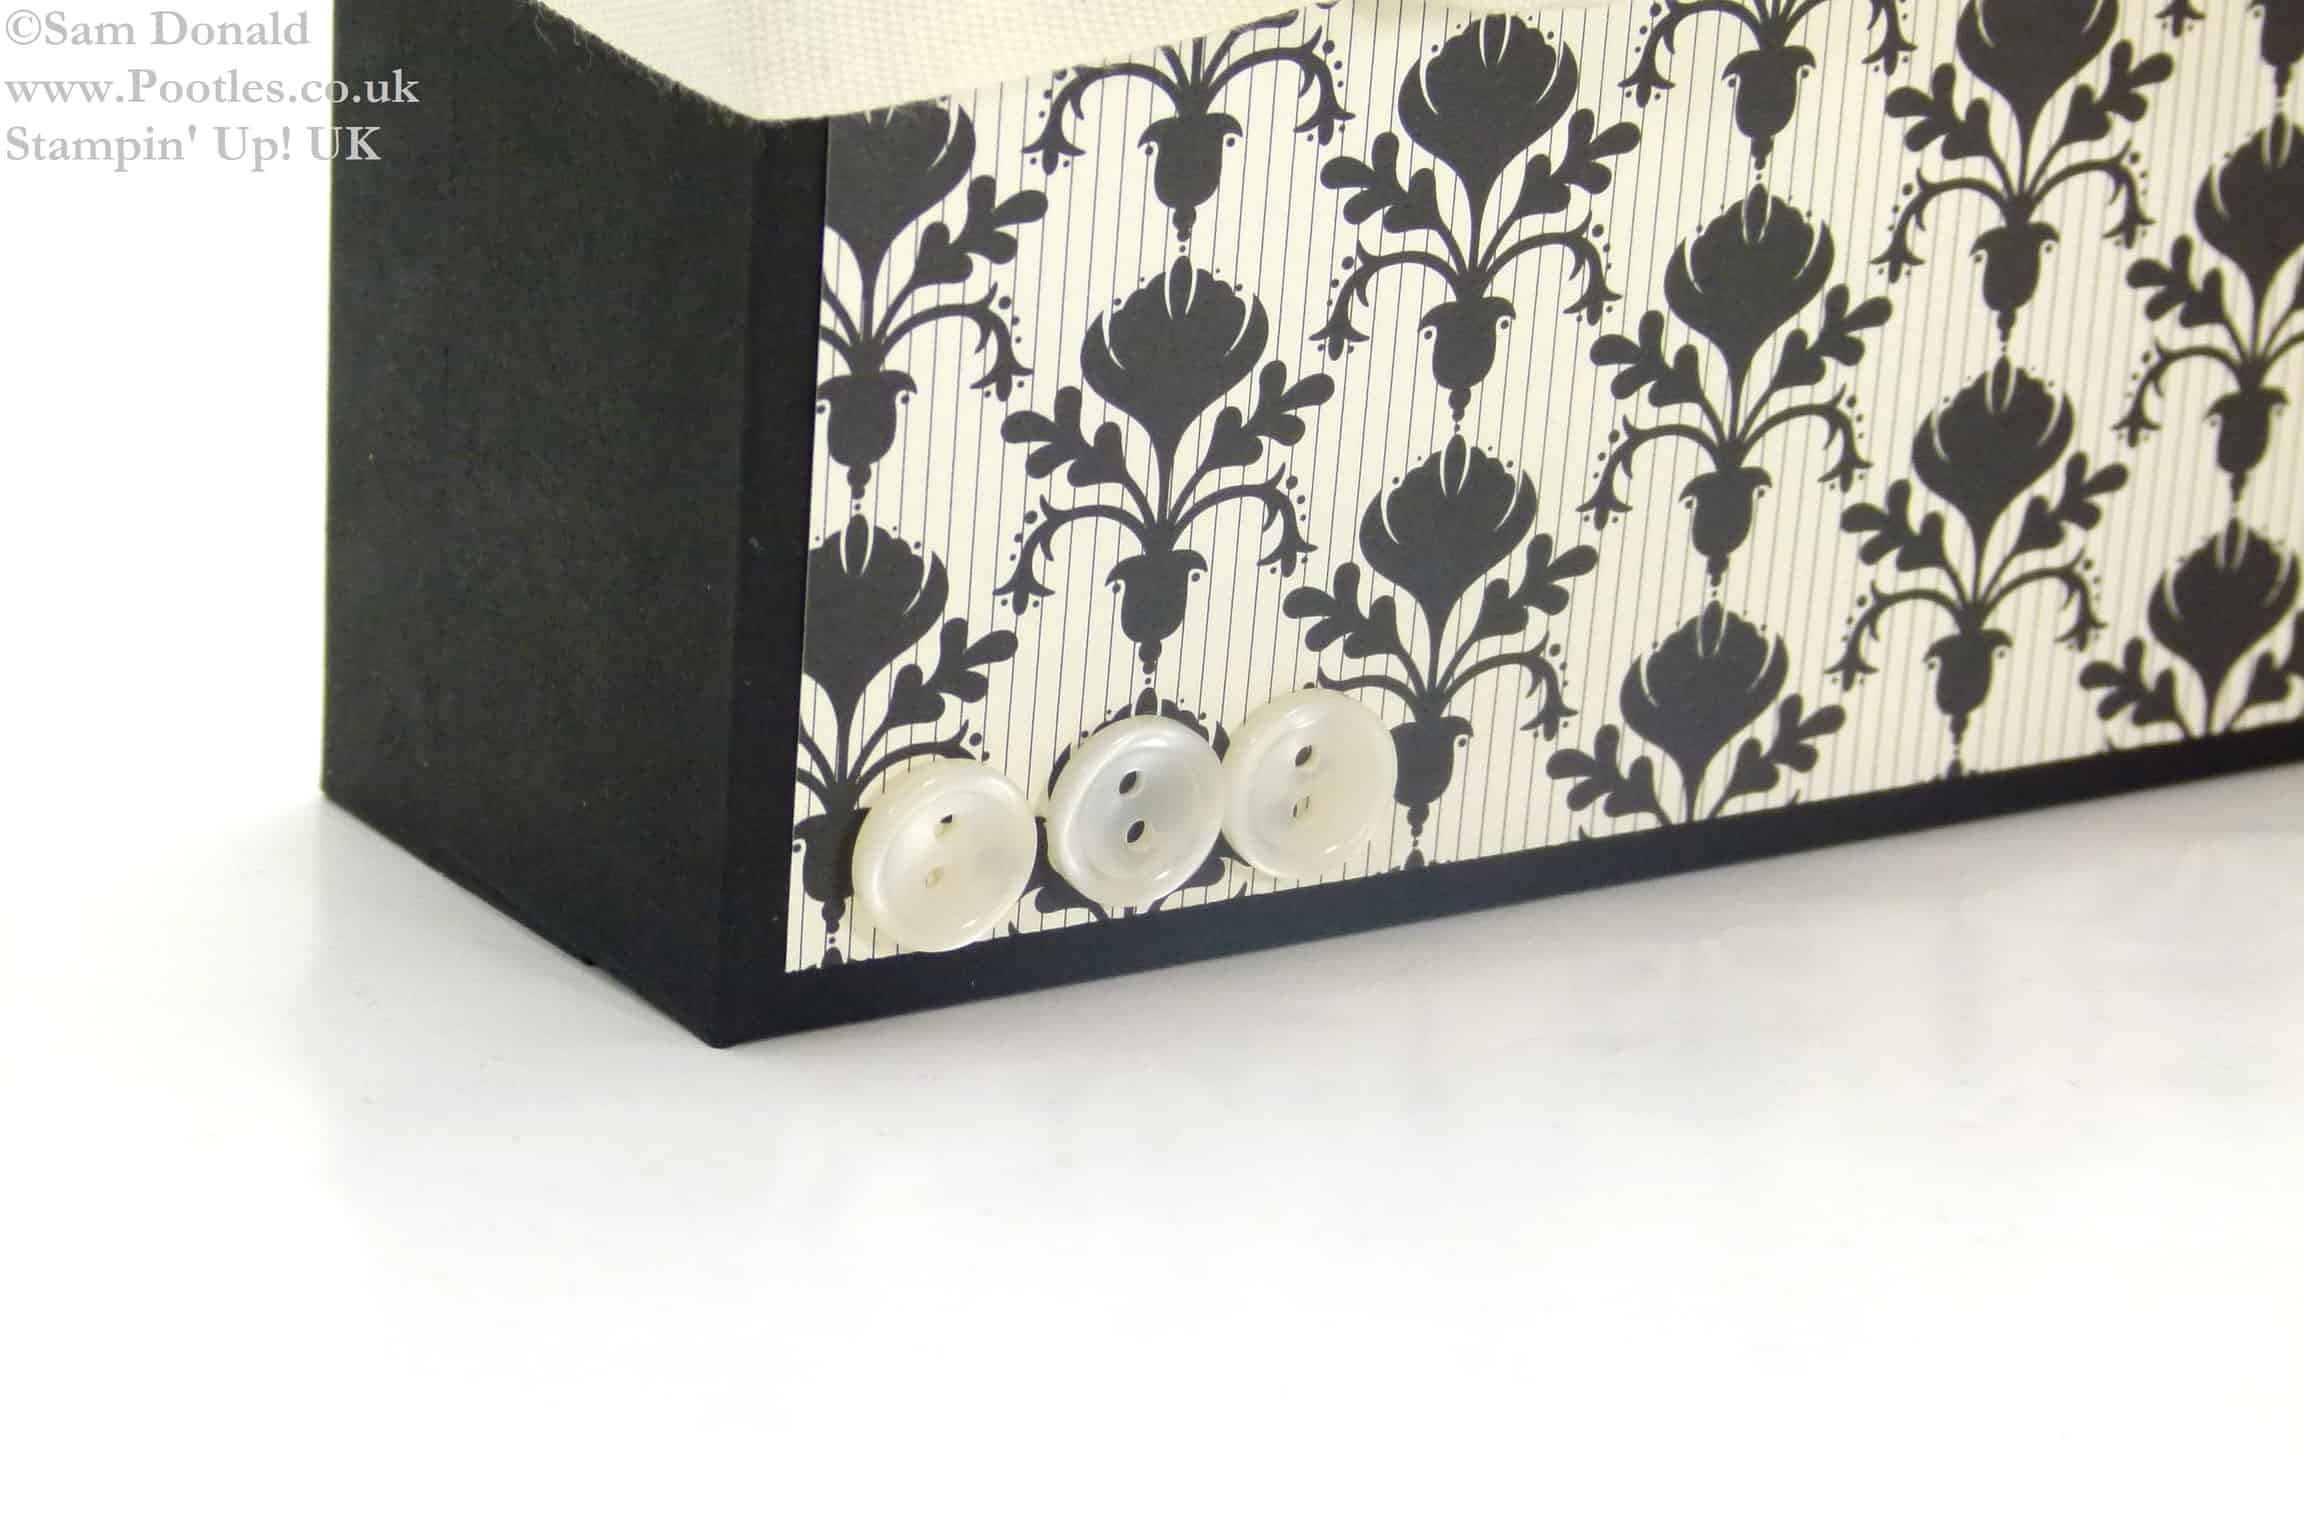 POOTLES Stampin Up Framelits Storage Box Tutorial